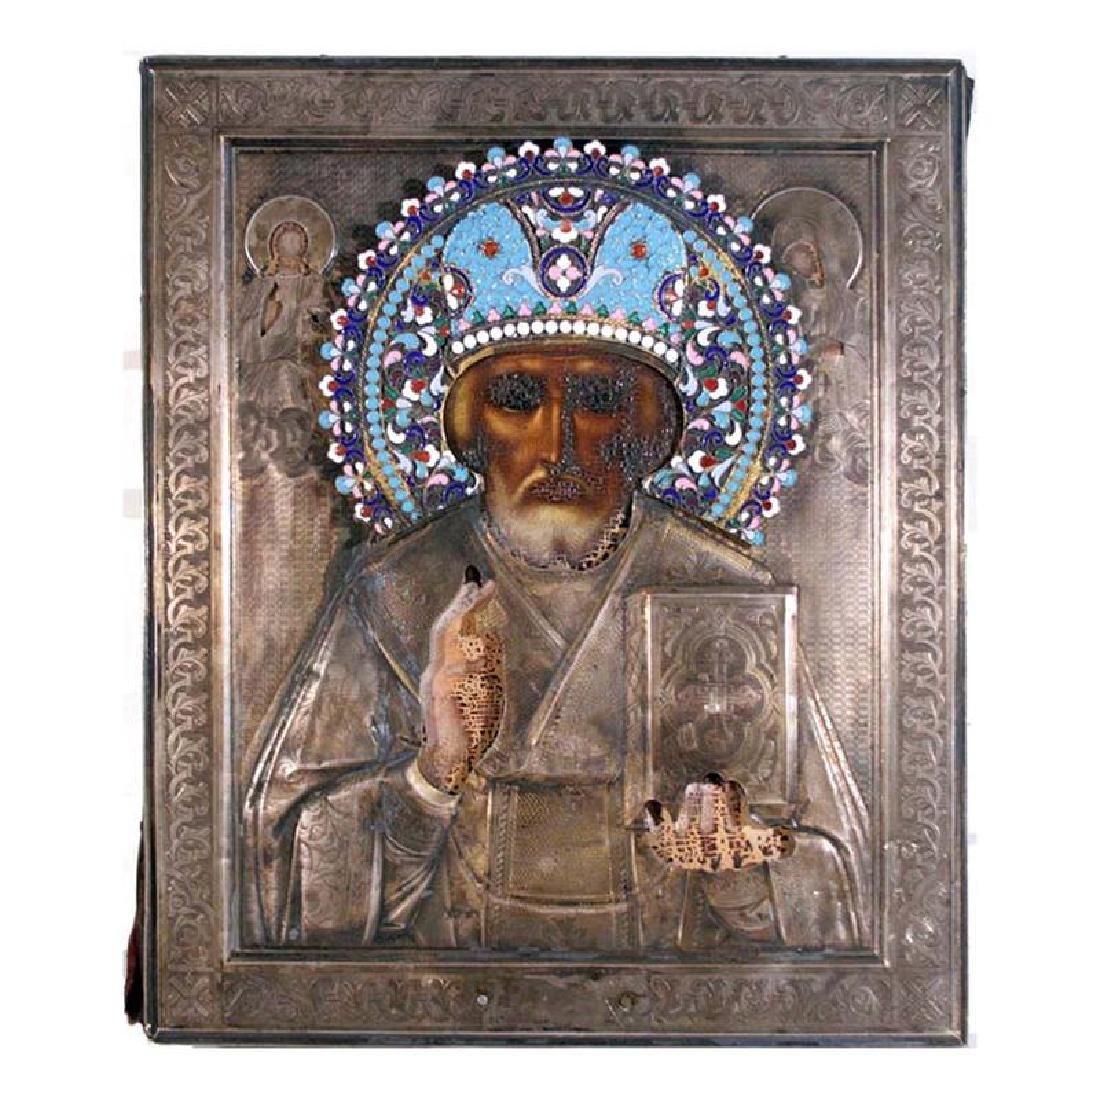 St. Nikolai Antique Russian Icon, 19th C